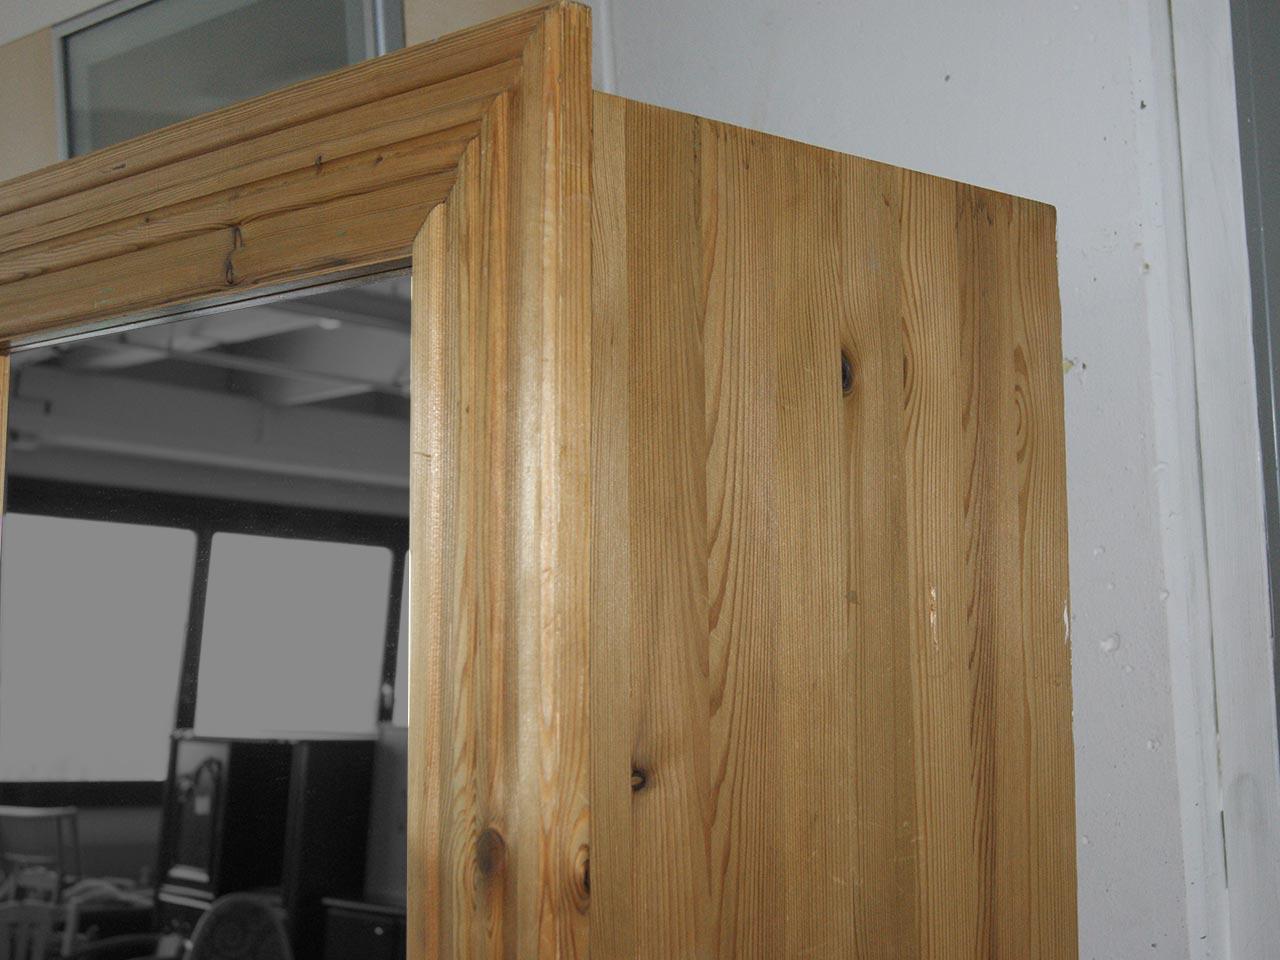 schuhh ngeschrank schuhschrank landhausstil fichte massiv f r 30 paar schuhe ebay. Black Bedroom Furniture Sets. Home Design Ideas